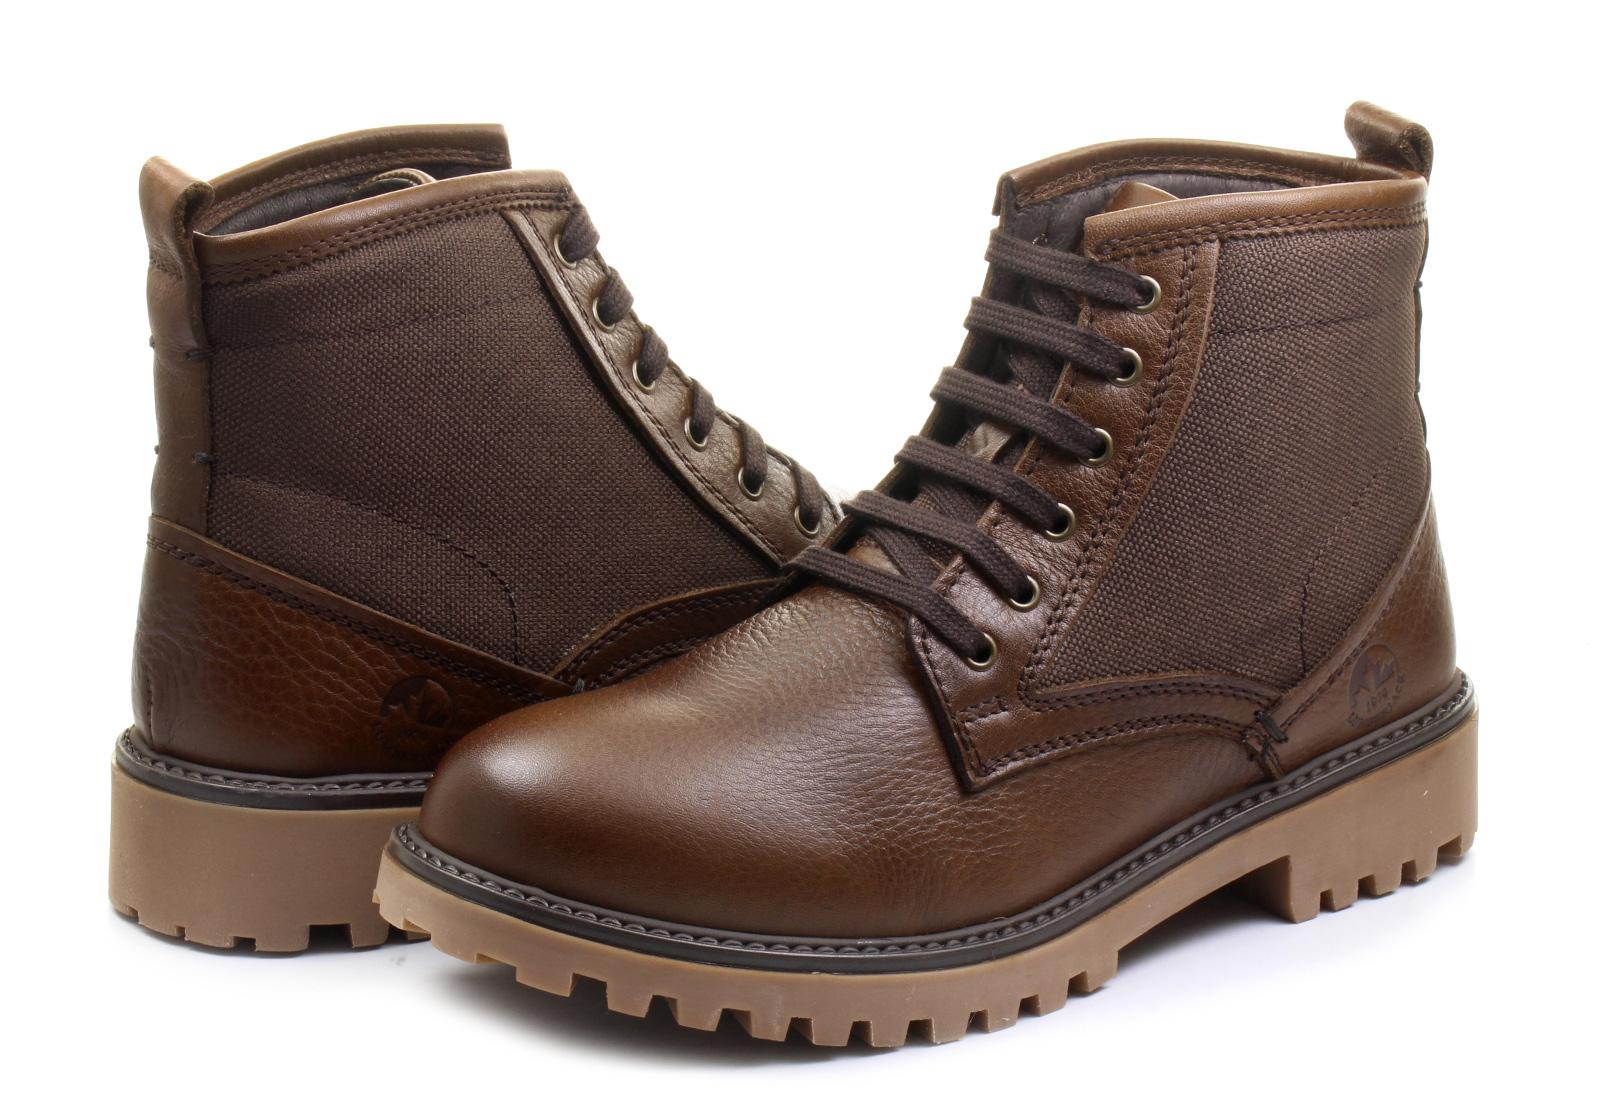 Simple Home Gt Women39s Shoes Gt Short Boots Gt Lumberjack River Lady Women